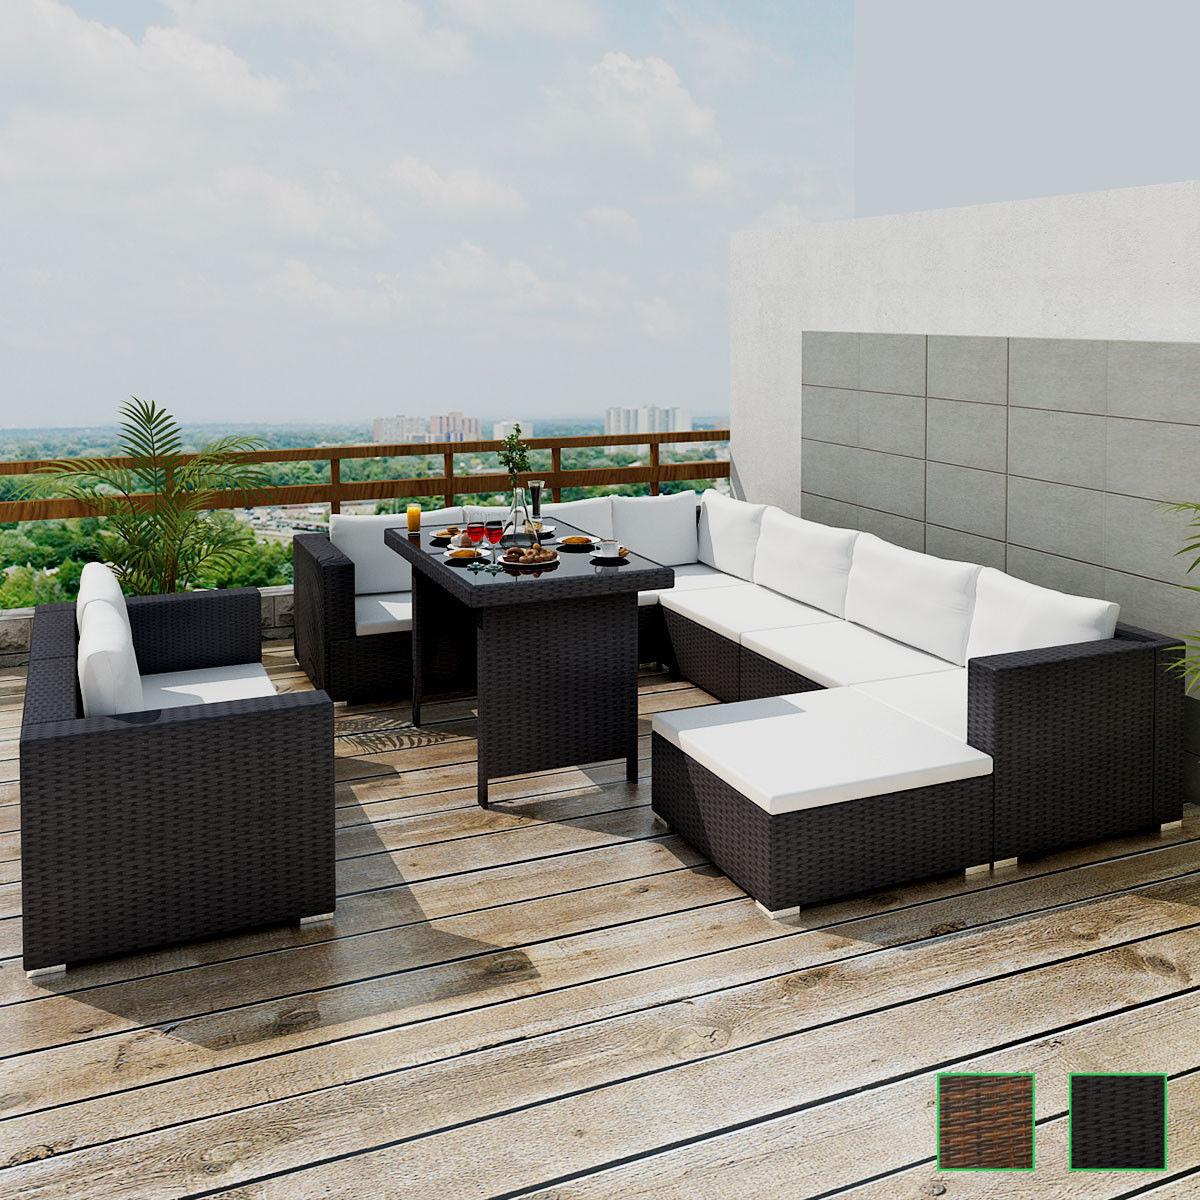 Full Size of Rattan Sofa Outdoor Sectional Furniture Wicker Patio Set Deck Mit Led Türkis Schlaf Big Kaufen 3 2 1 Sitzer Weiß Leder Canape Ektorp Günstige Modulares Sofa Rattan Sofa